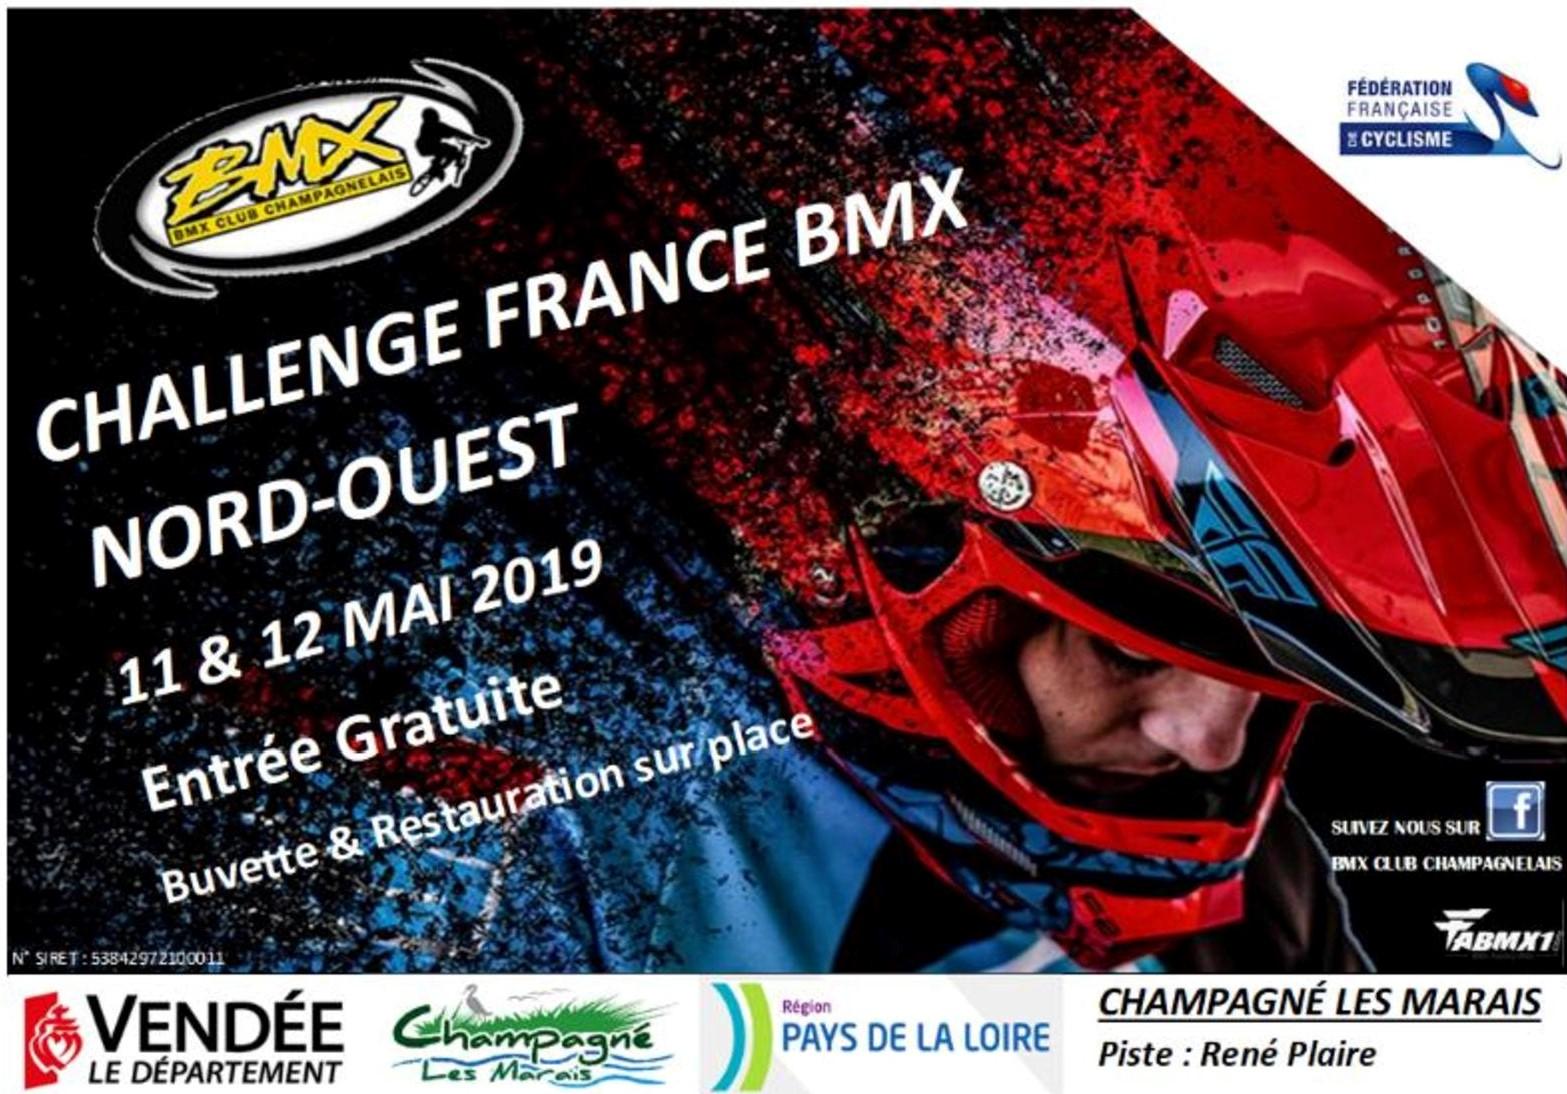 Guide competition bmx challenge nord ouest champagne les marais